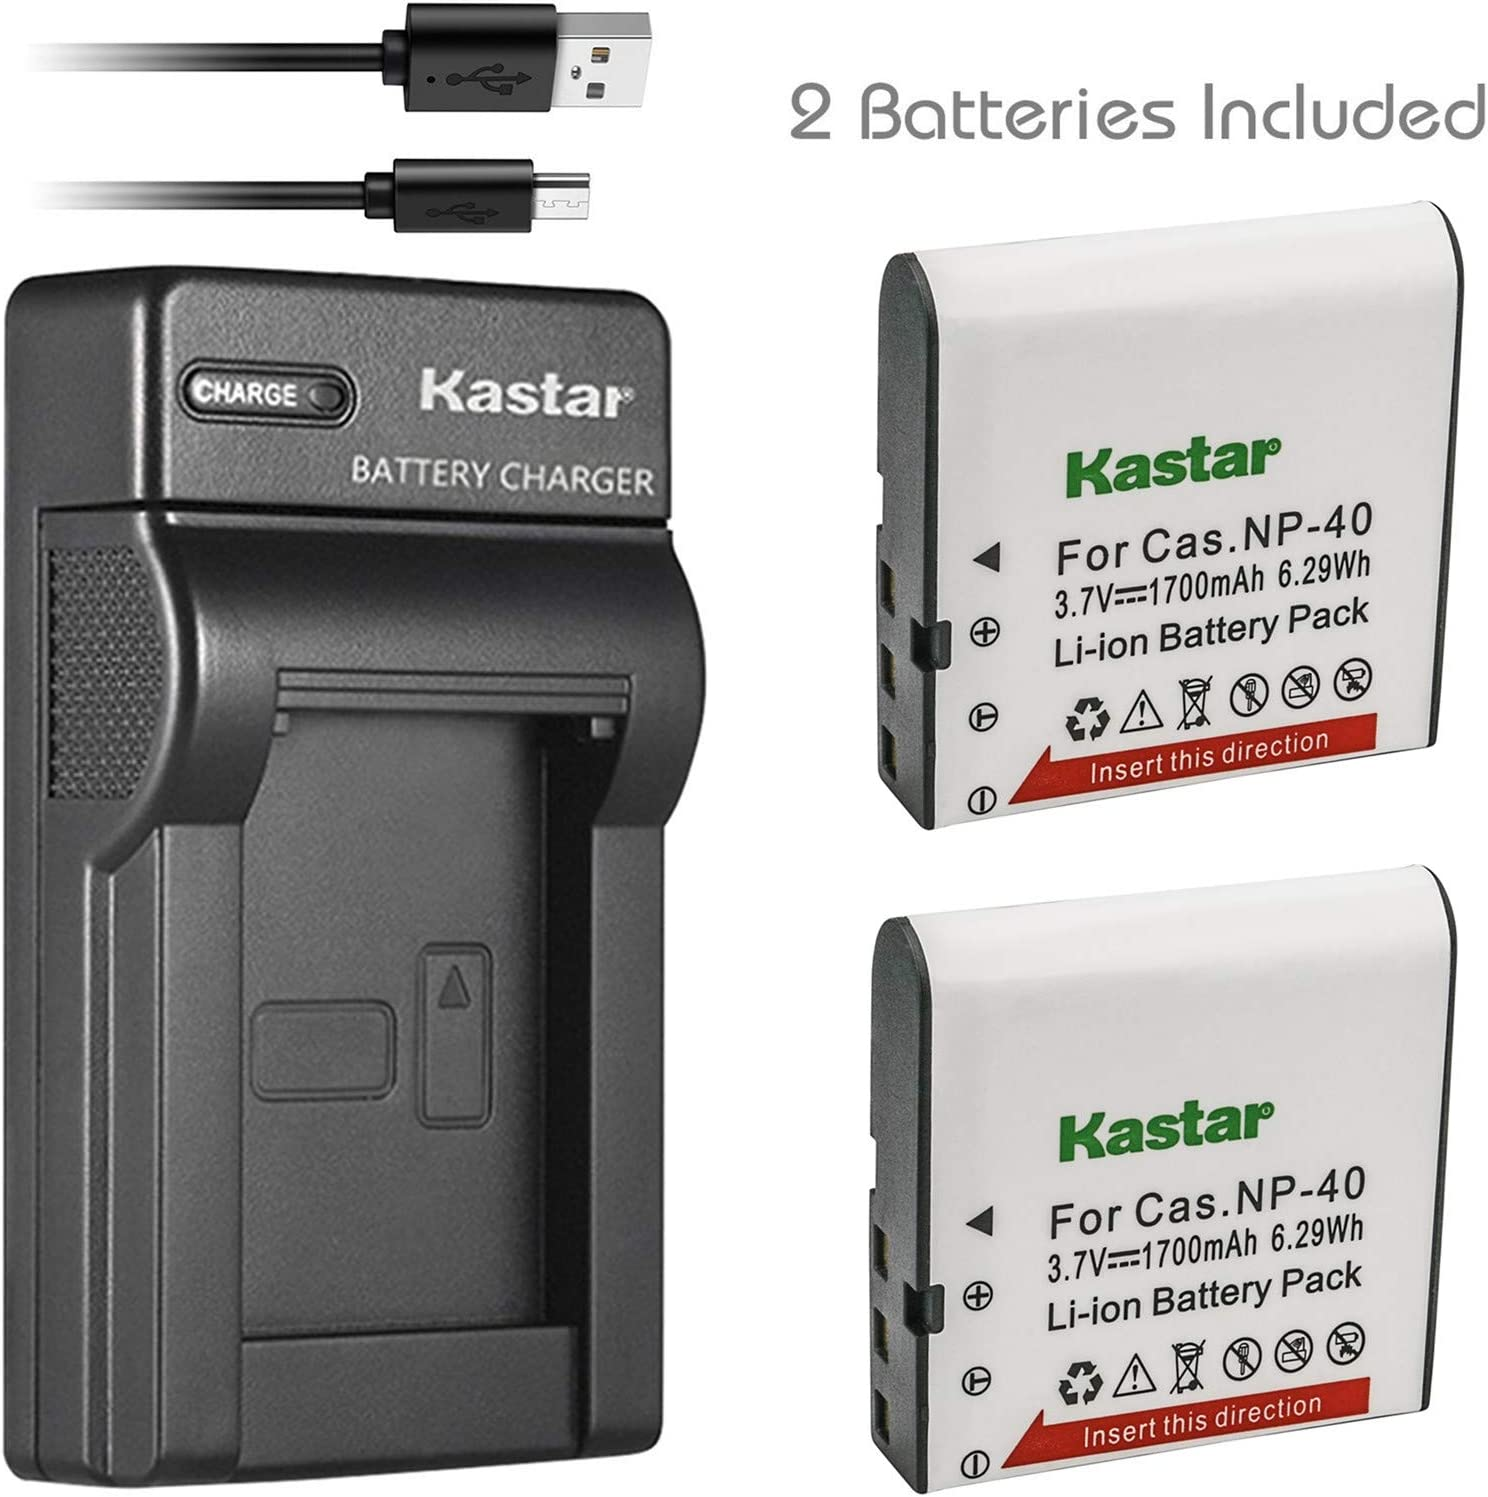 Kastar Battery (X2) & Slim USB Charger for Casio NP-40 and Exilim Z400 FC100 FC150 FC160S P505 P600 P700 Z100 Z1000 Z1050 Z1080 Z1200 Z200 Z30 Z300 Z40 Z450 Z50 Z500 Z55 Z57 PRO EX-Z600 Z700 Z750 Z850